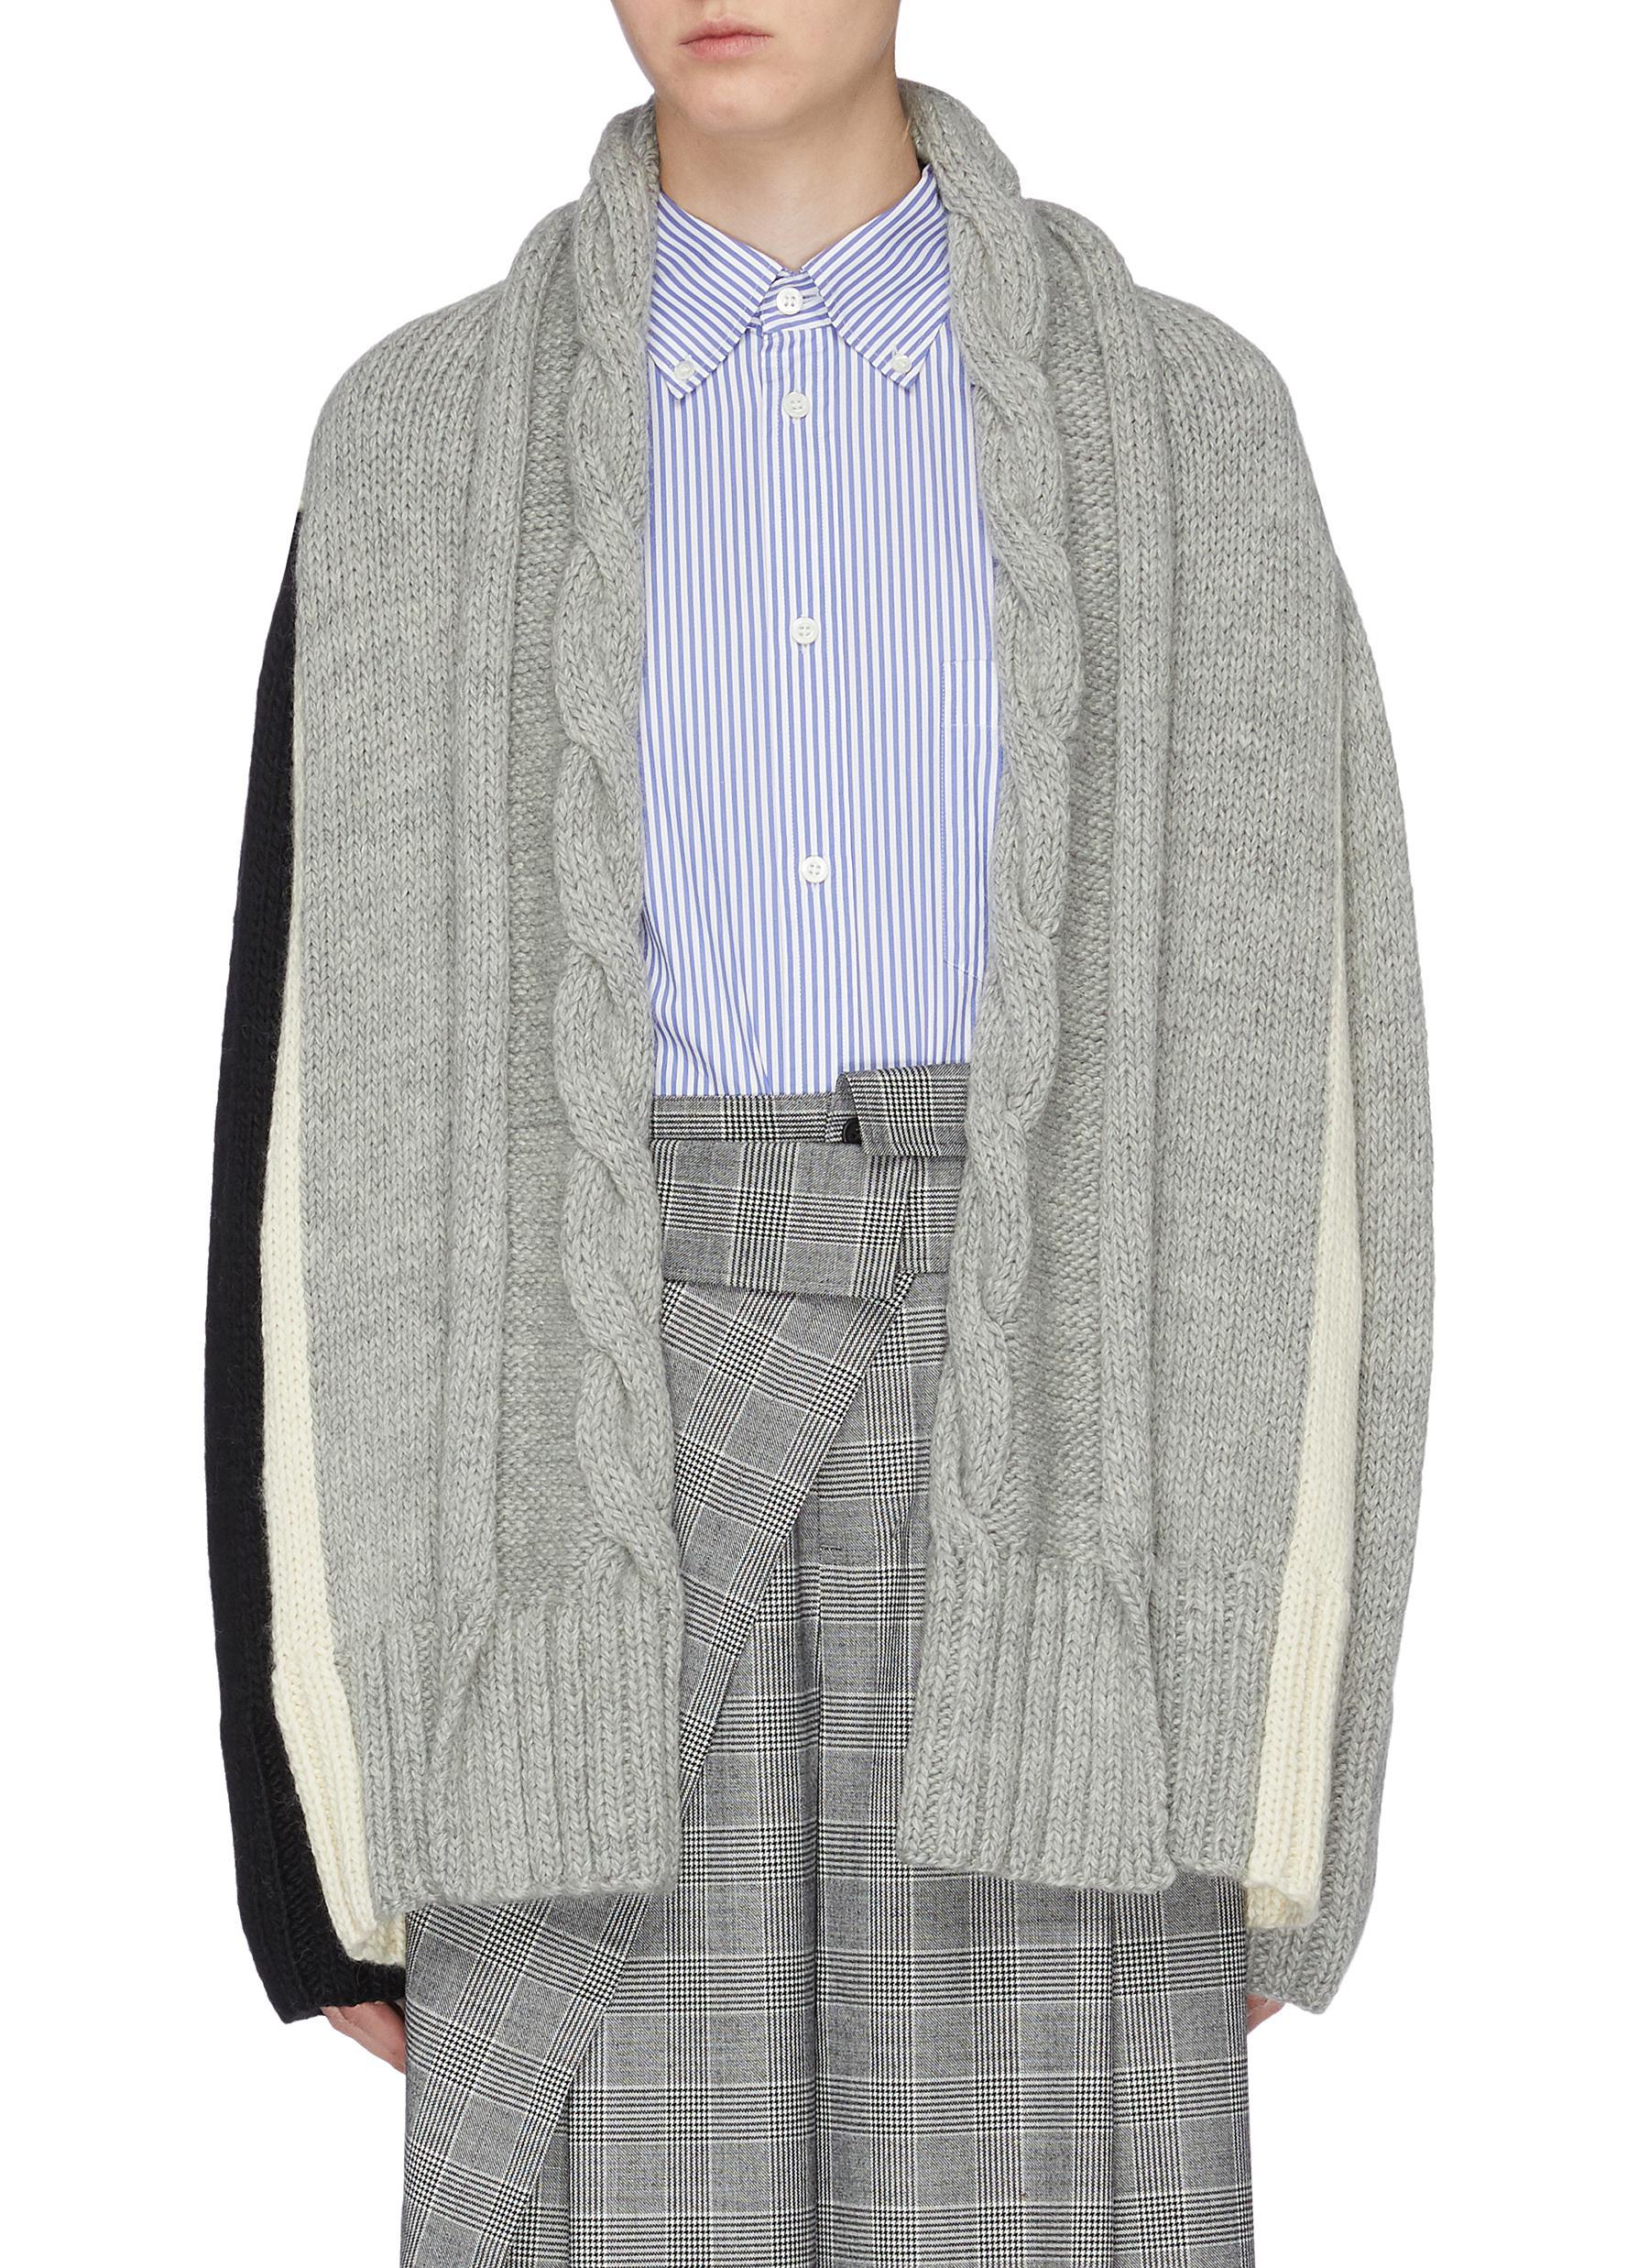 Colourblock shawl collar cardigan by The Keiji